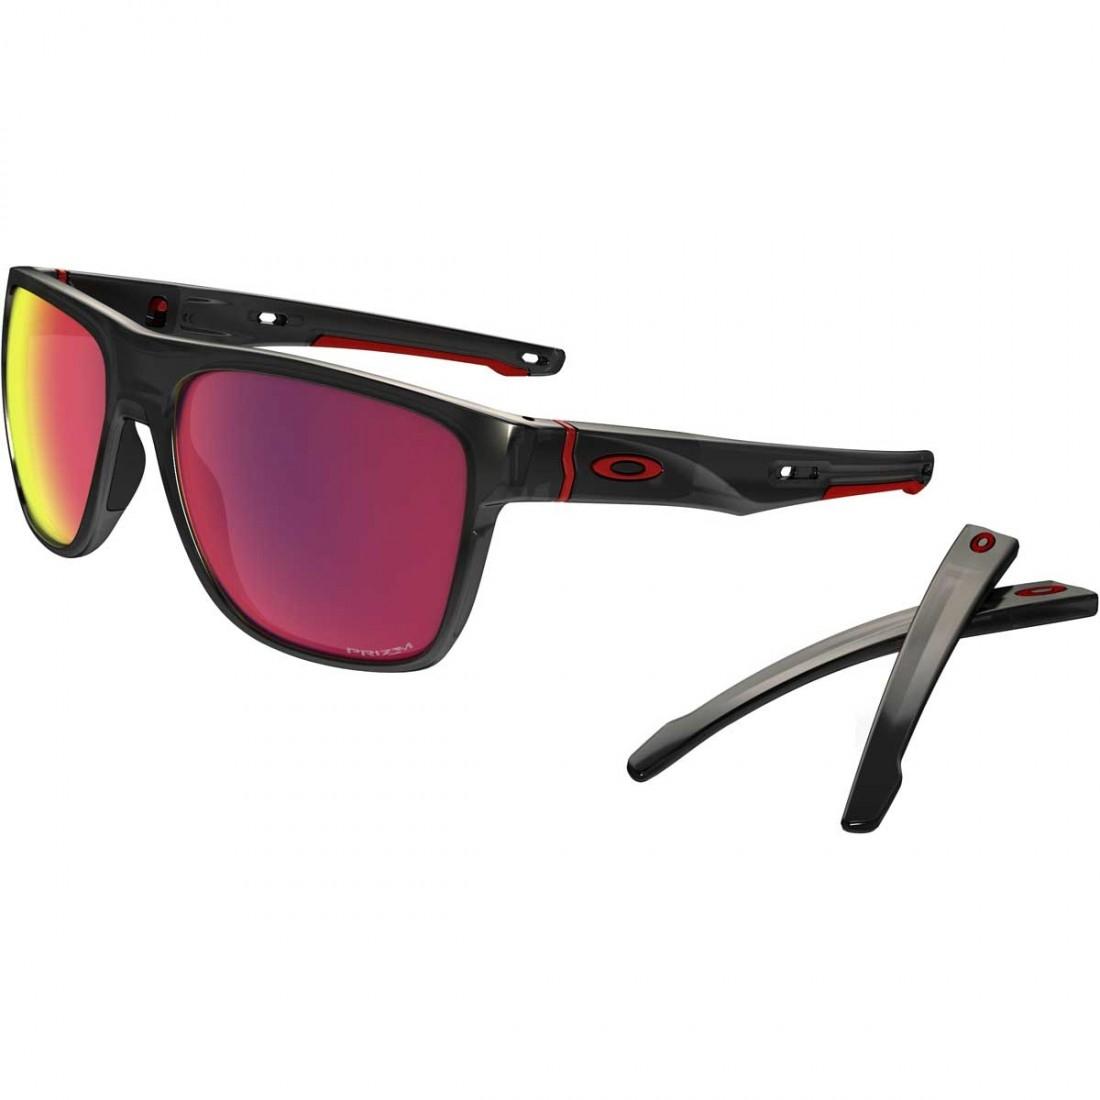 61d11c8ae0 OAKLEY Crossrange XL Black Ink   Prizm Road Sun glasses · Motocard